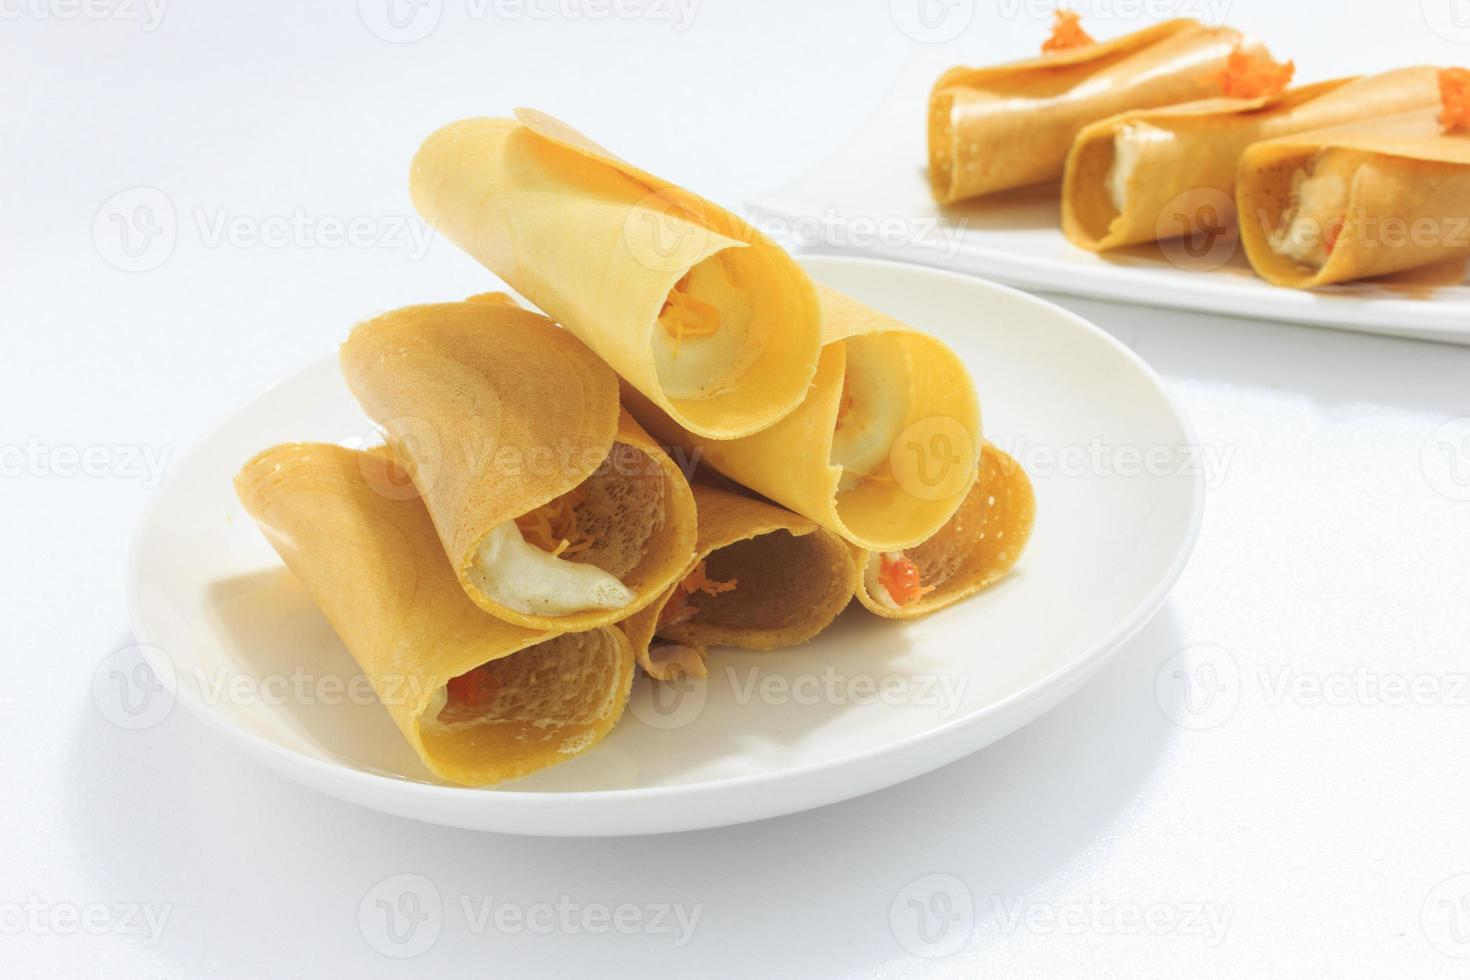 panqueque crujiente tailandés, postre tailandés foto